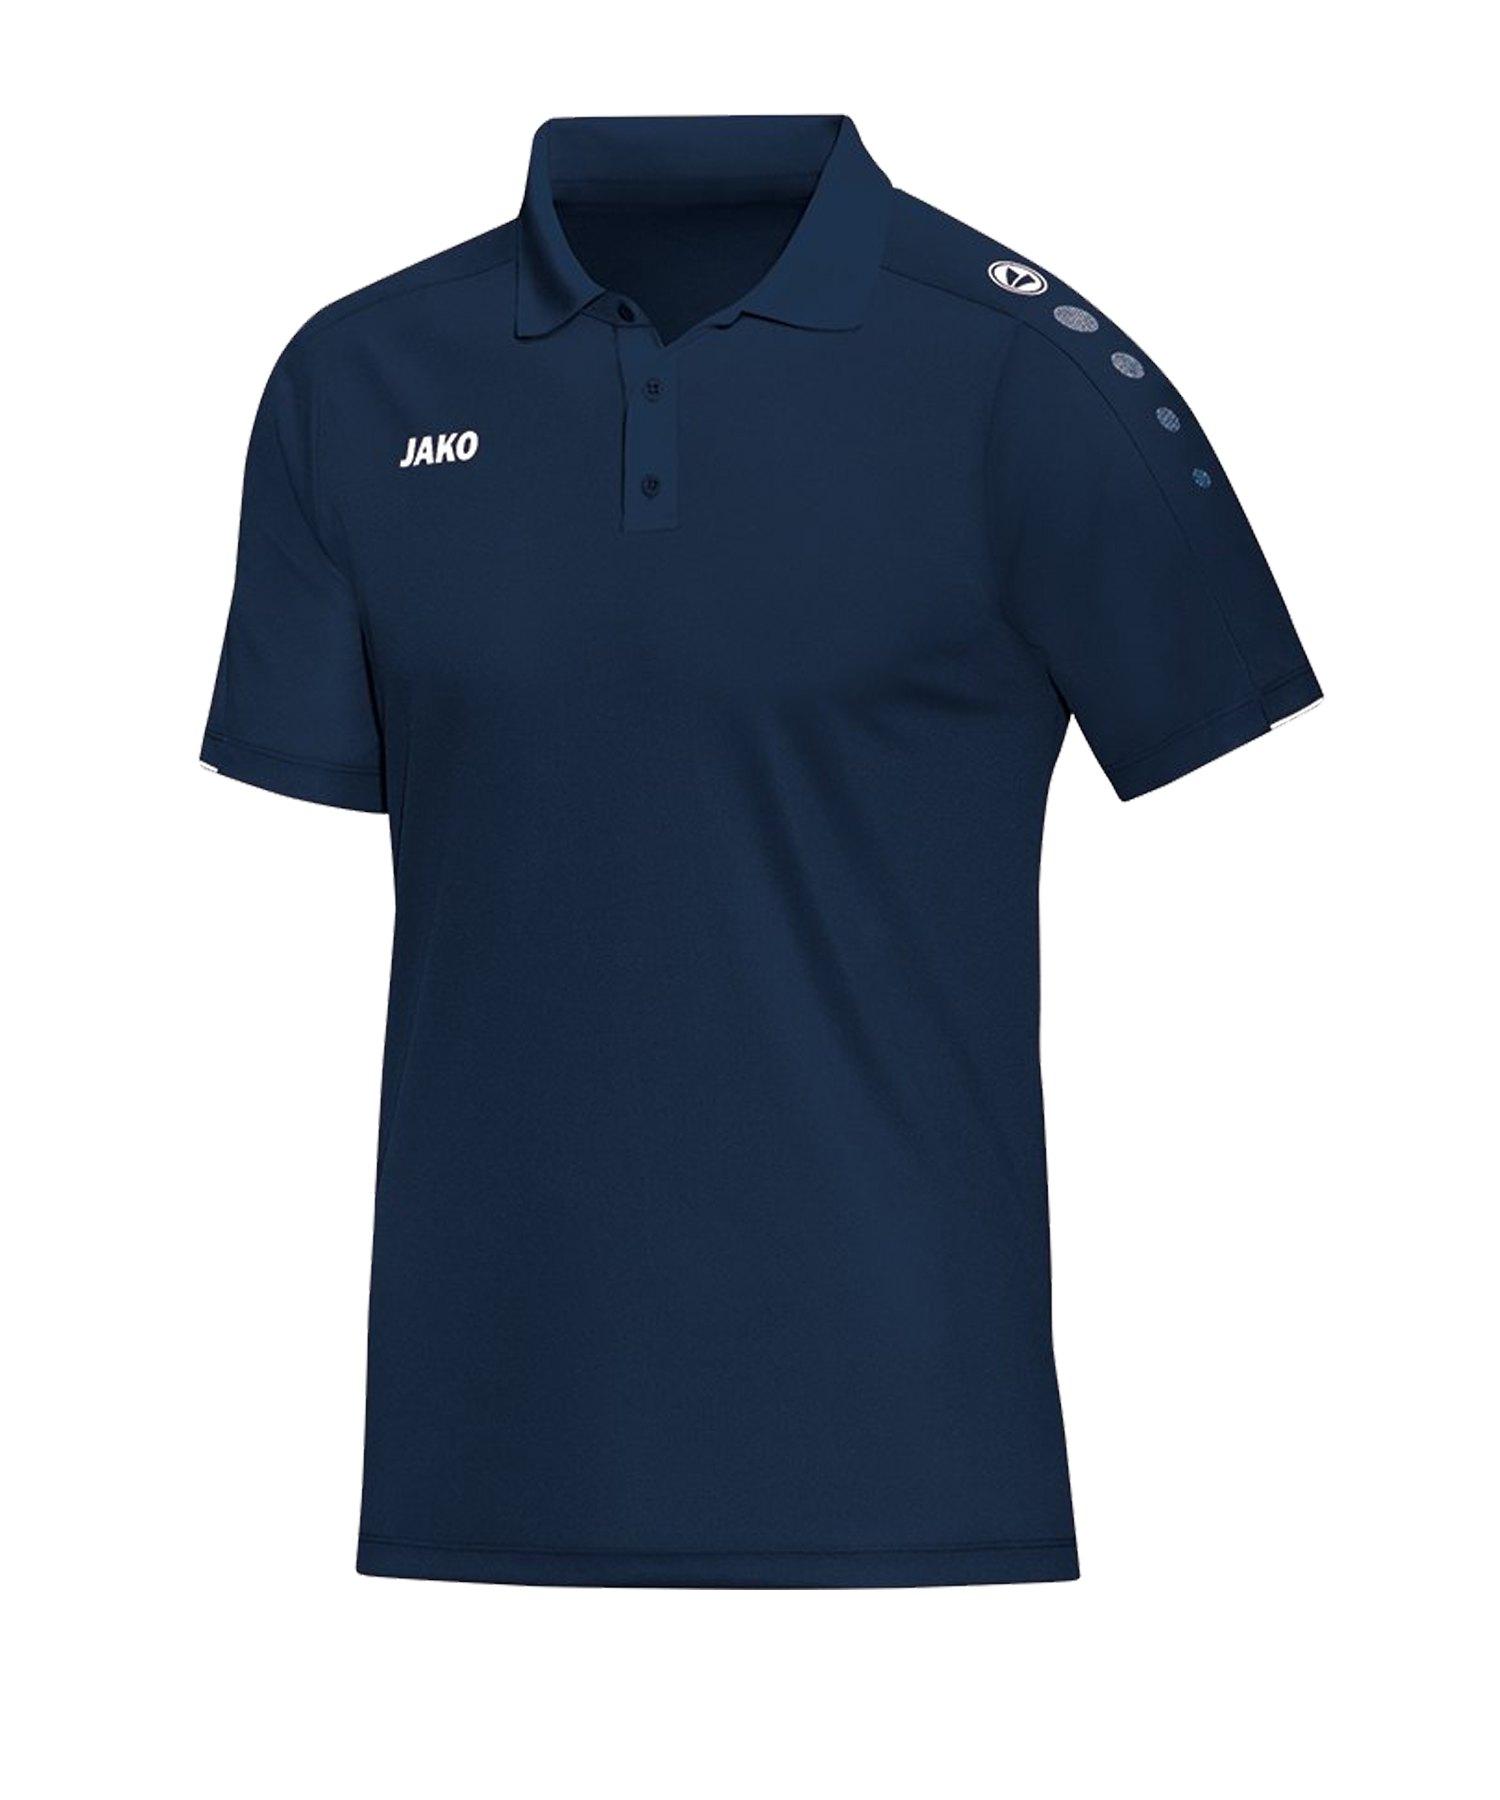 Jako Classico Poloshirt Kids Blau F09 - Blau